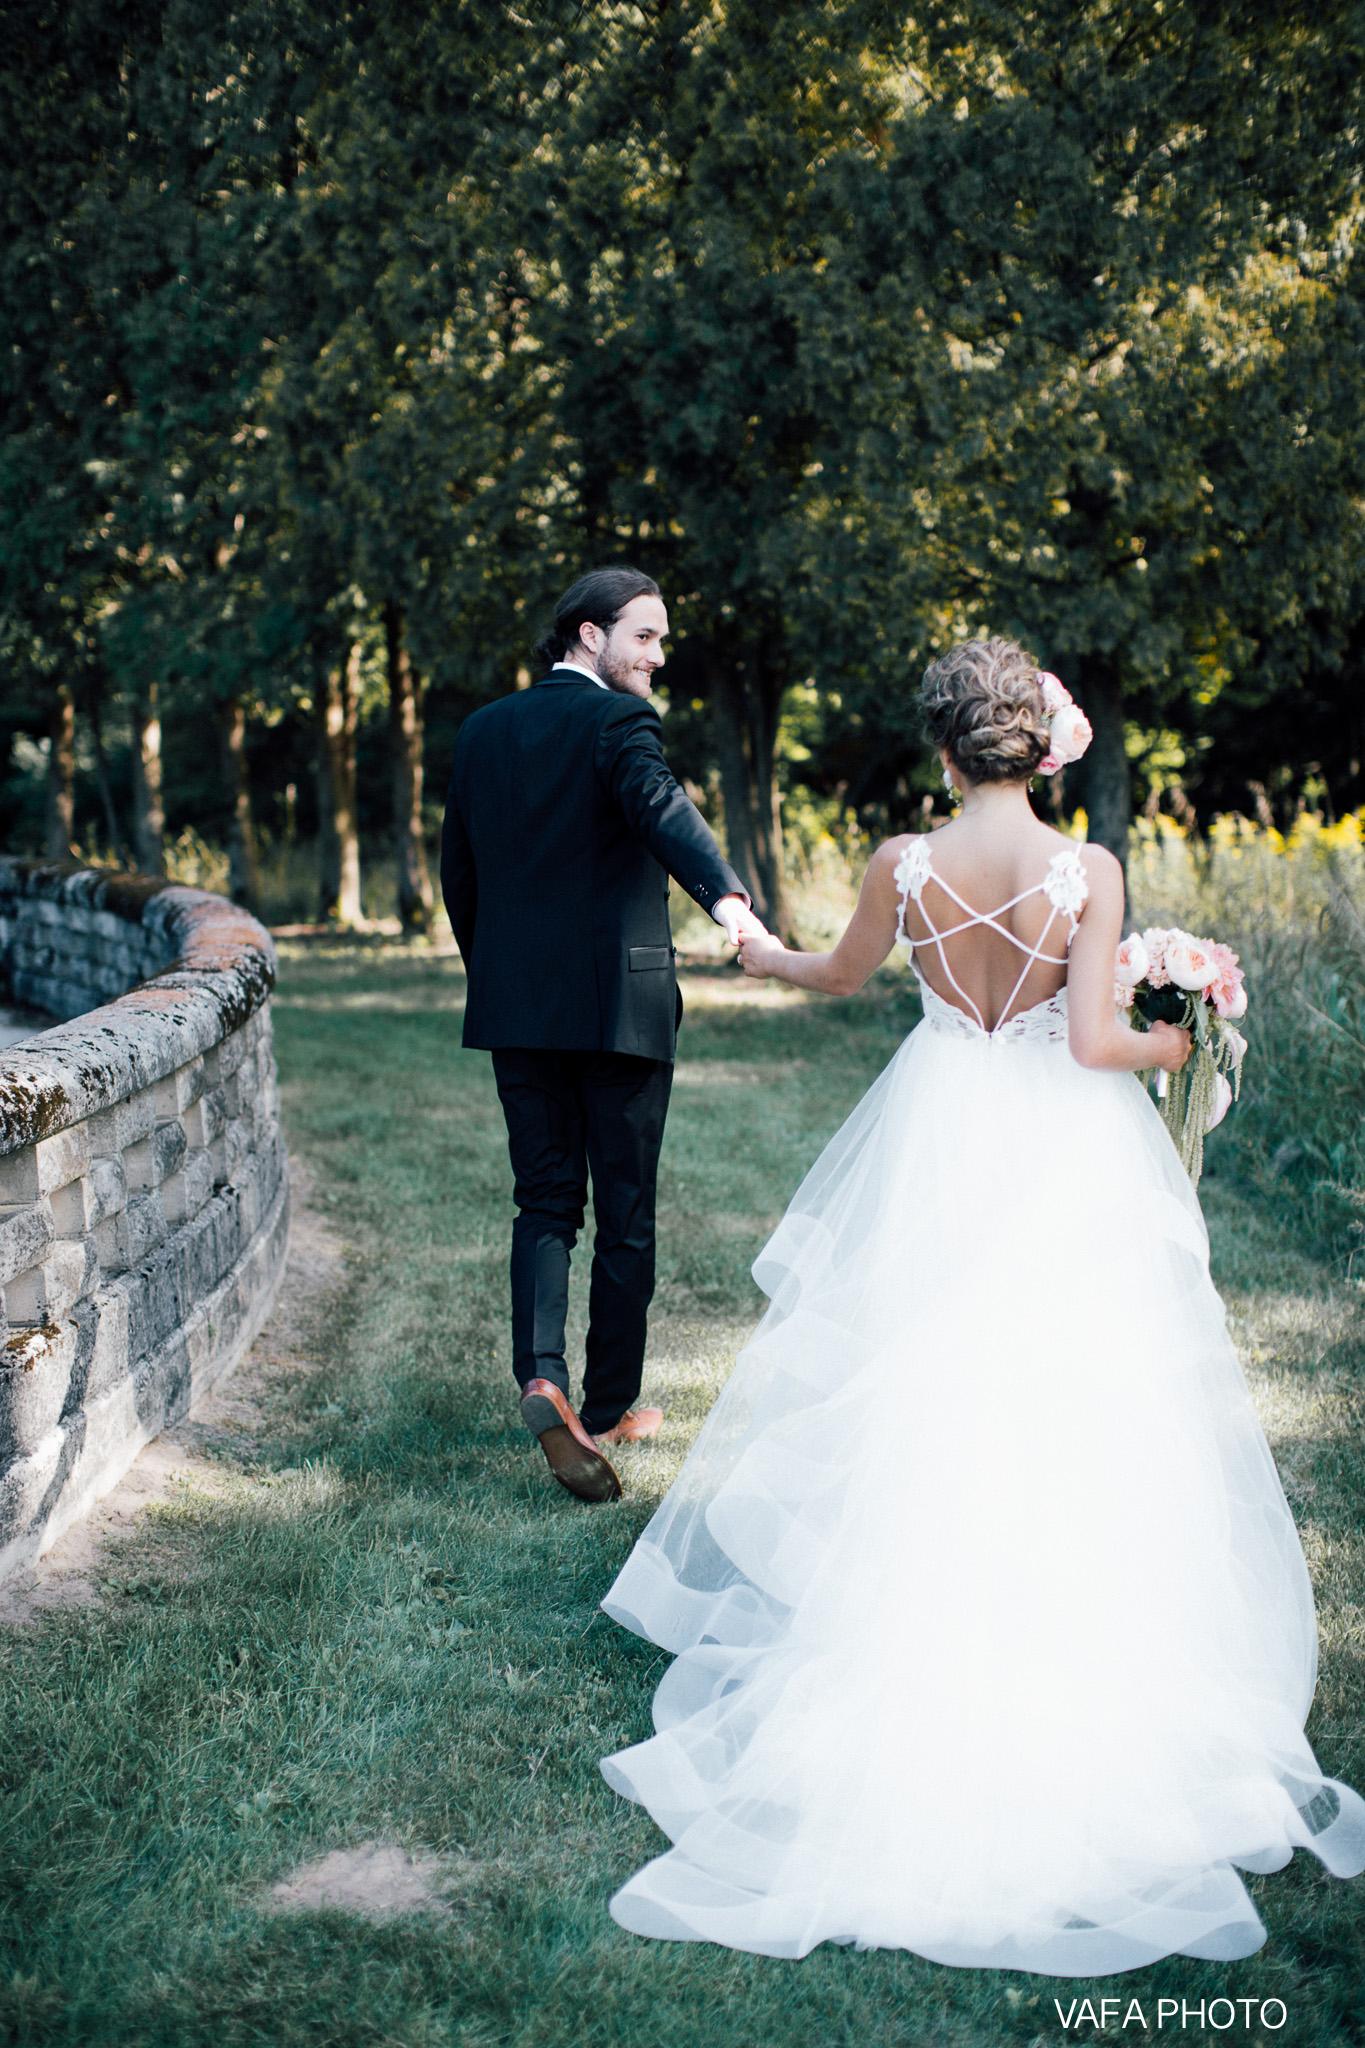 The-Felt-Estate-Wedding-Kailie-David-Vafa-Photo-616.jpg